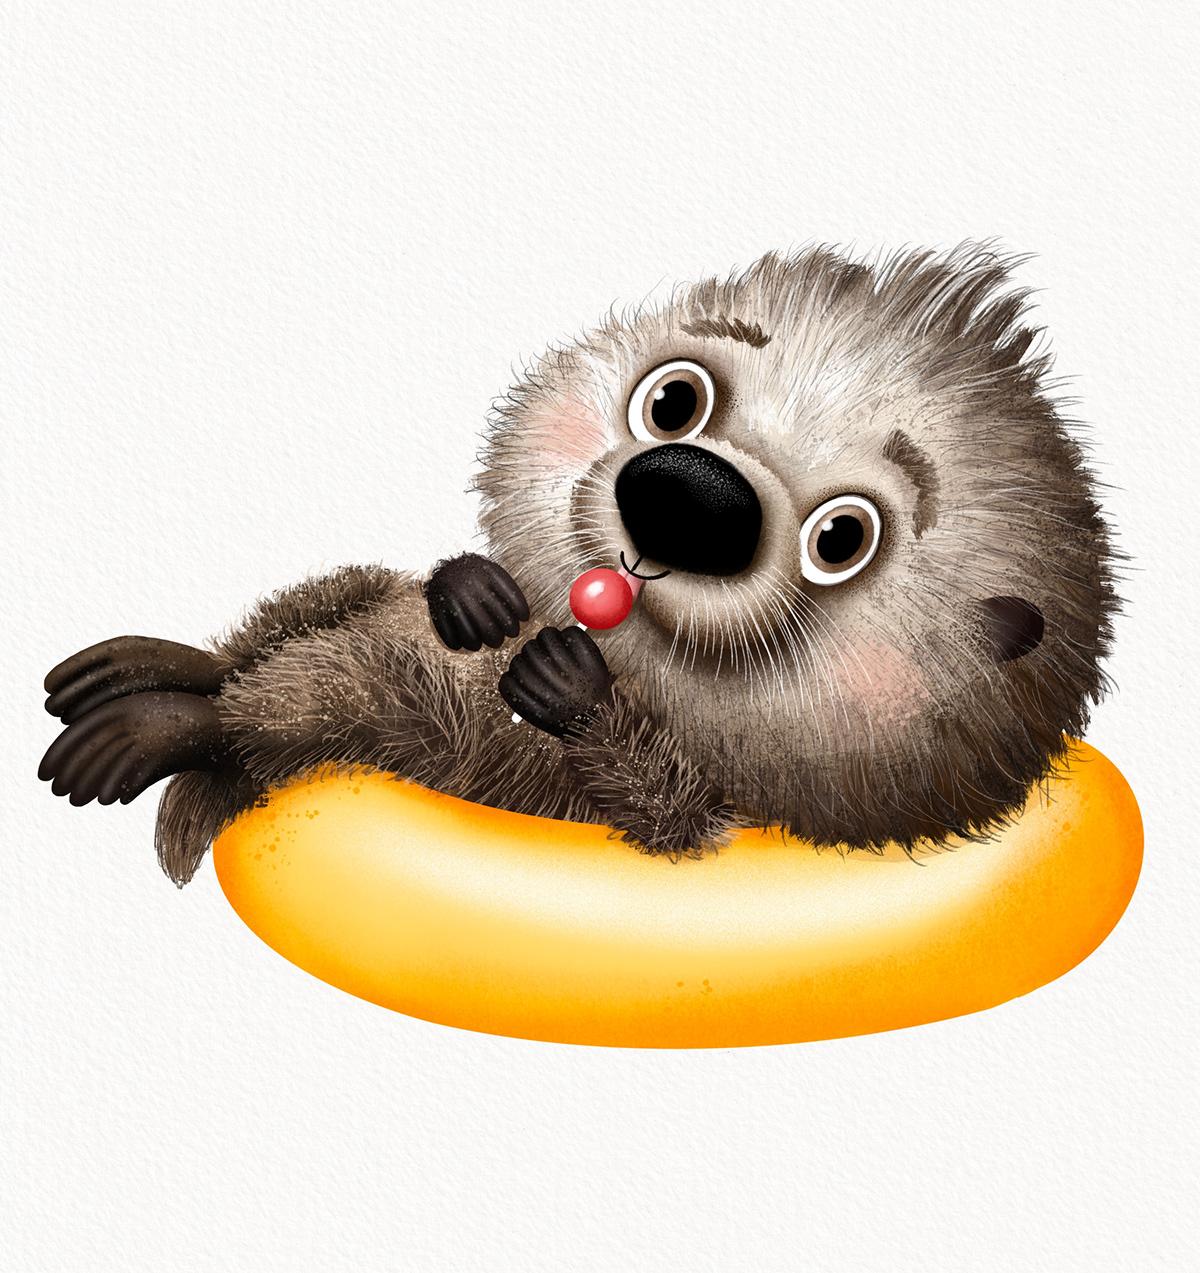 animals illustration Character children ChildrenIllustration cute Nature Ocean sea seaotter